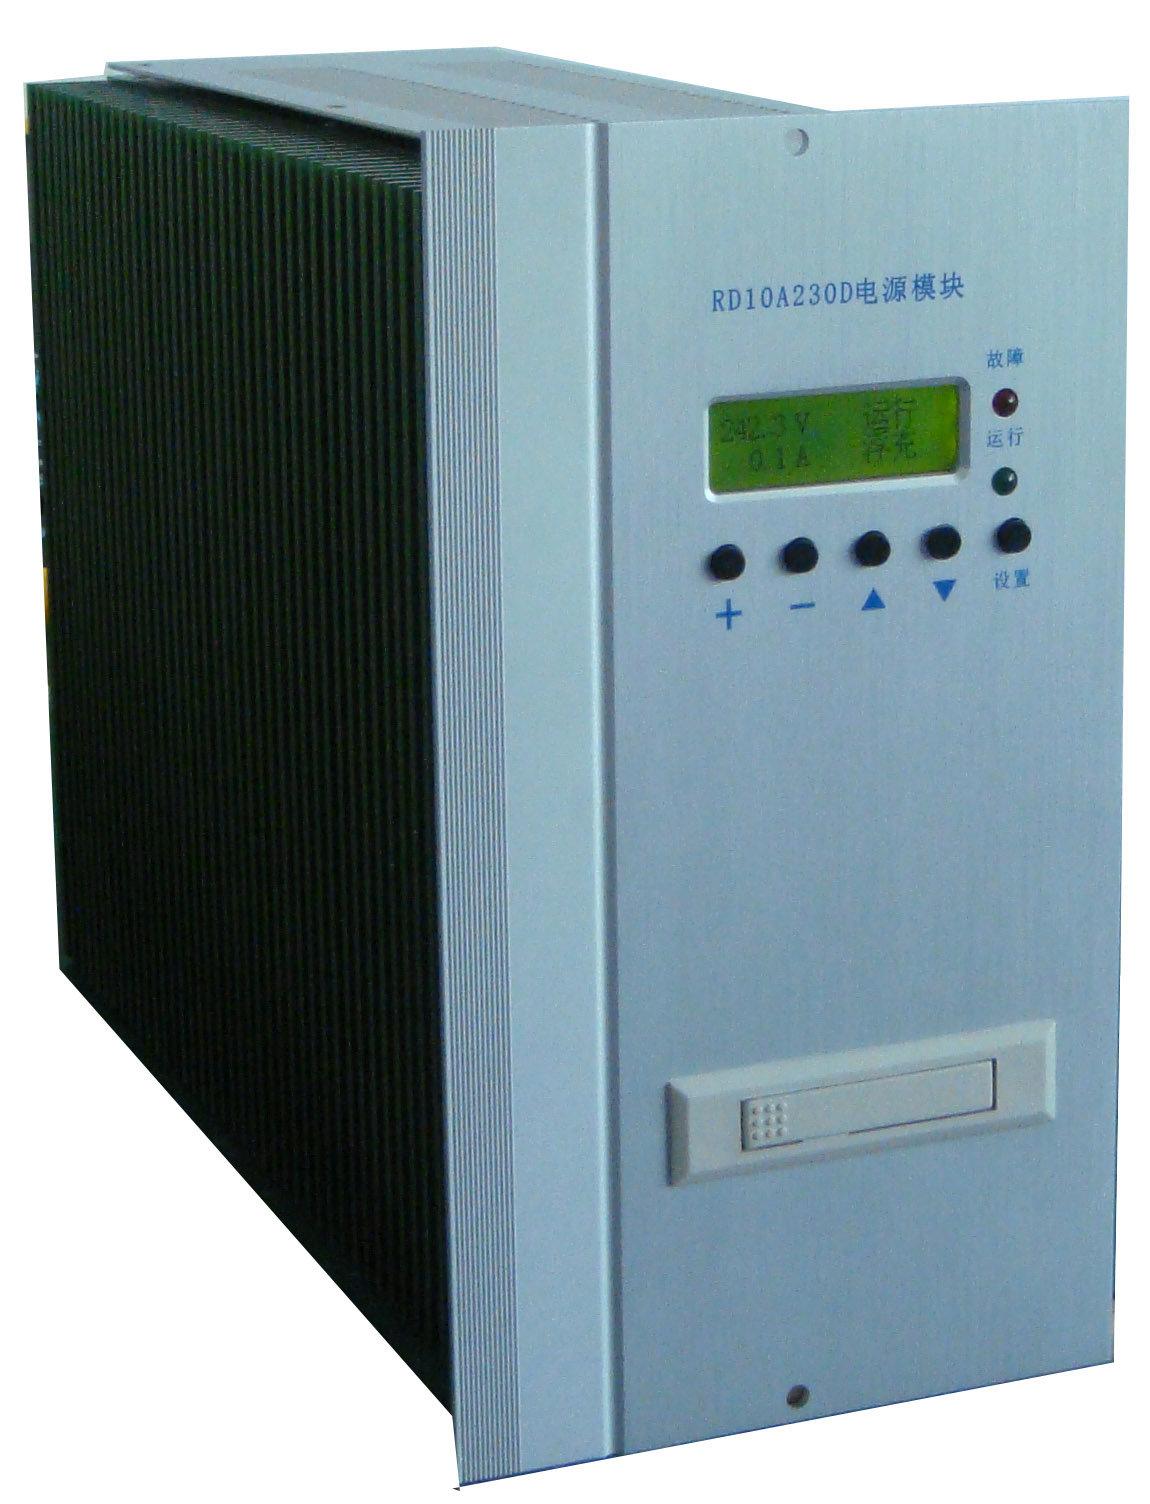 FX22010-1充電電源模塊